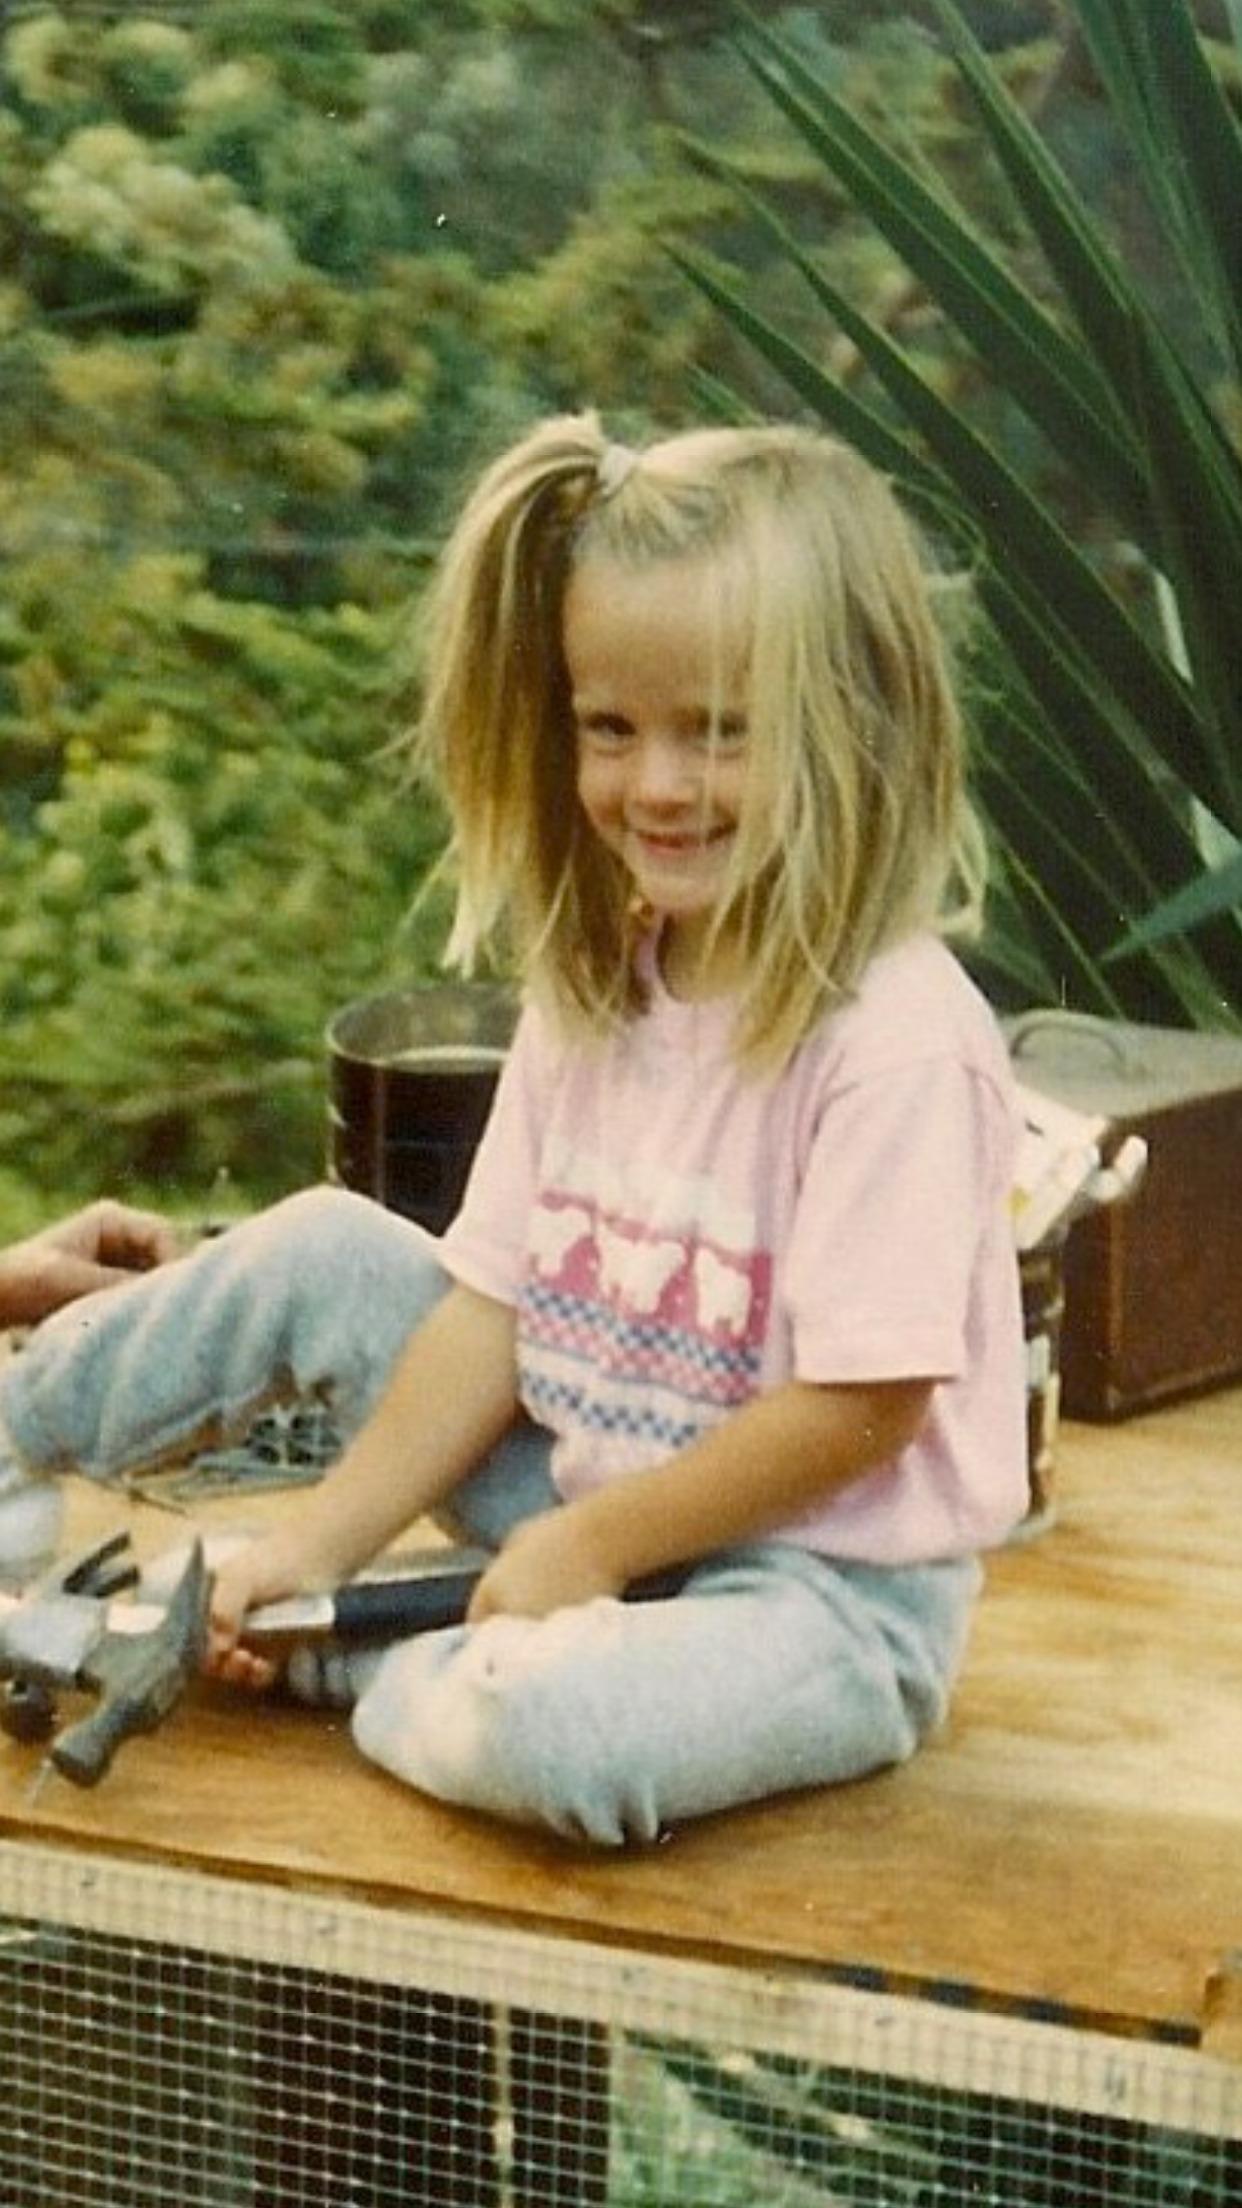 Lisa-Falzone-Child-Pic-1.JPG